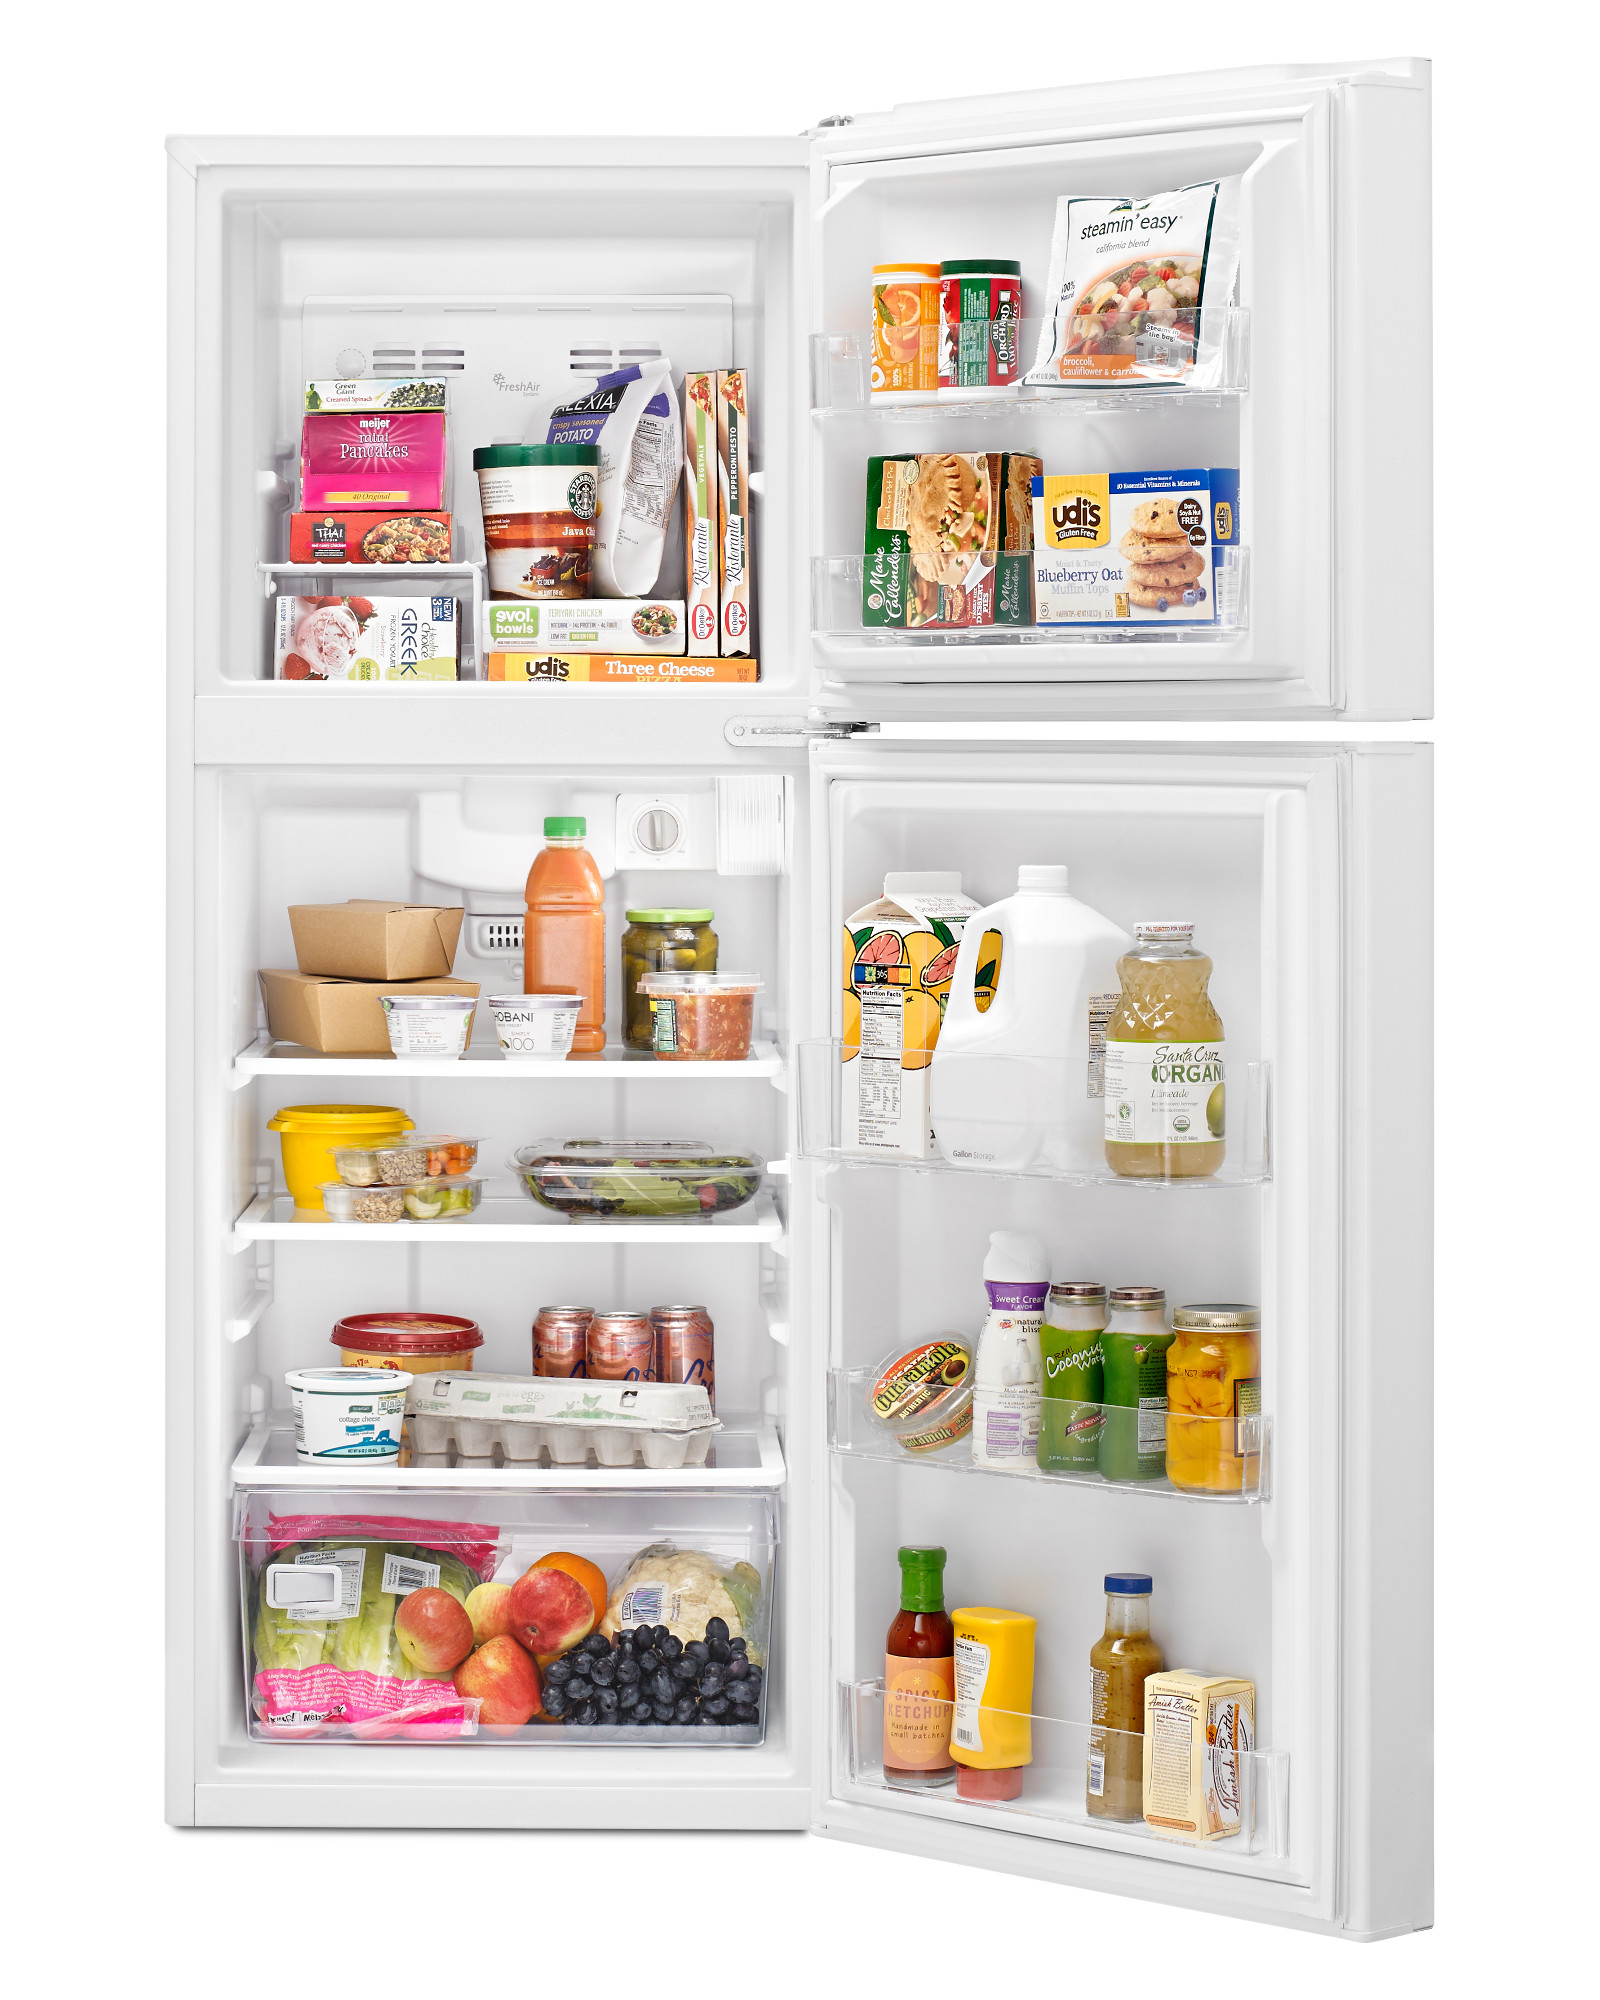 Whirlpool WRT111SFDW 11 cu. ft. Top Freezer Refrigerator - White